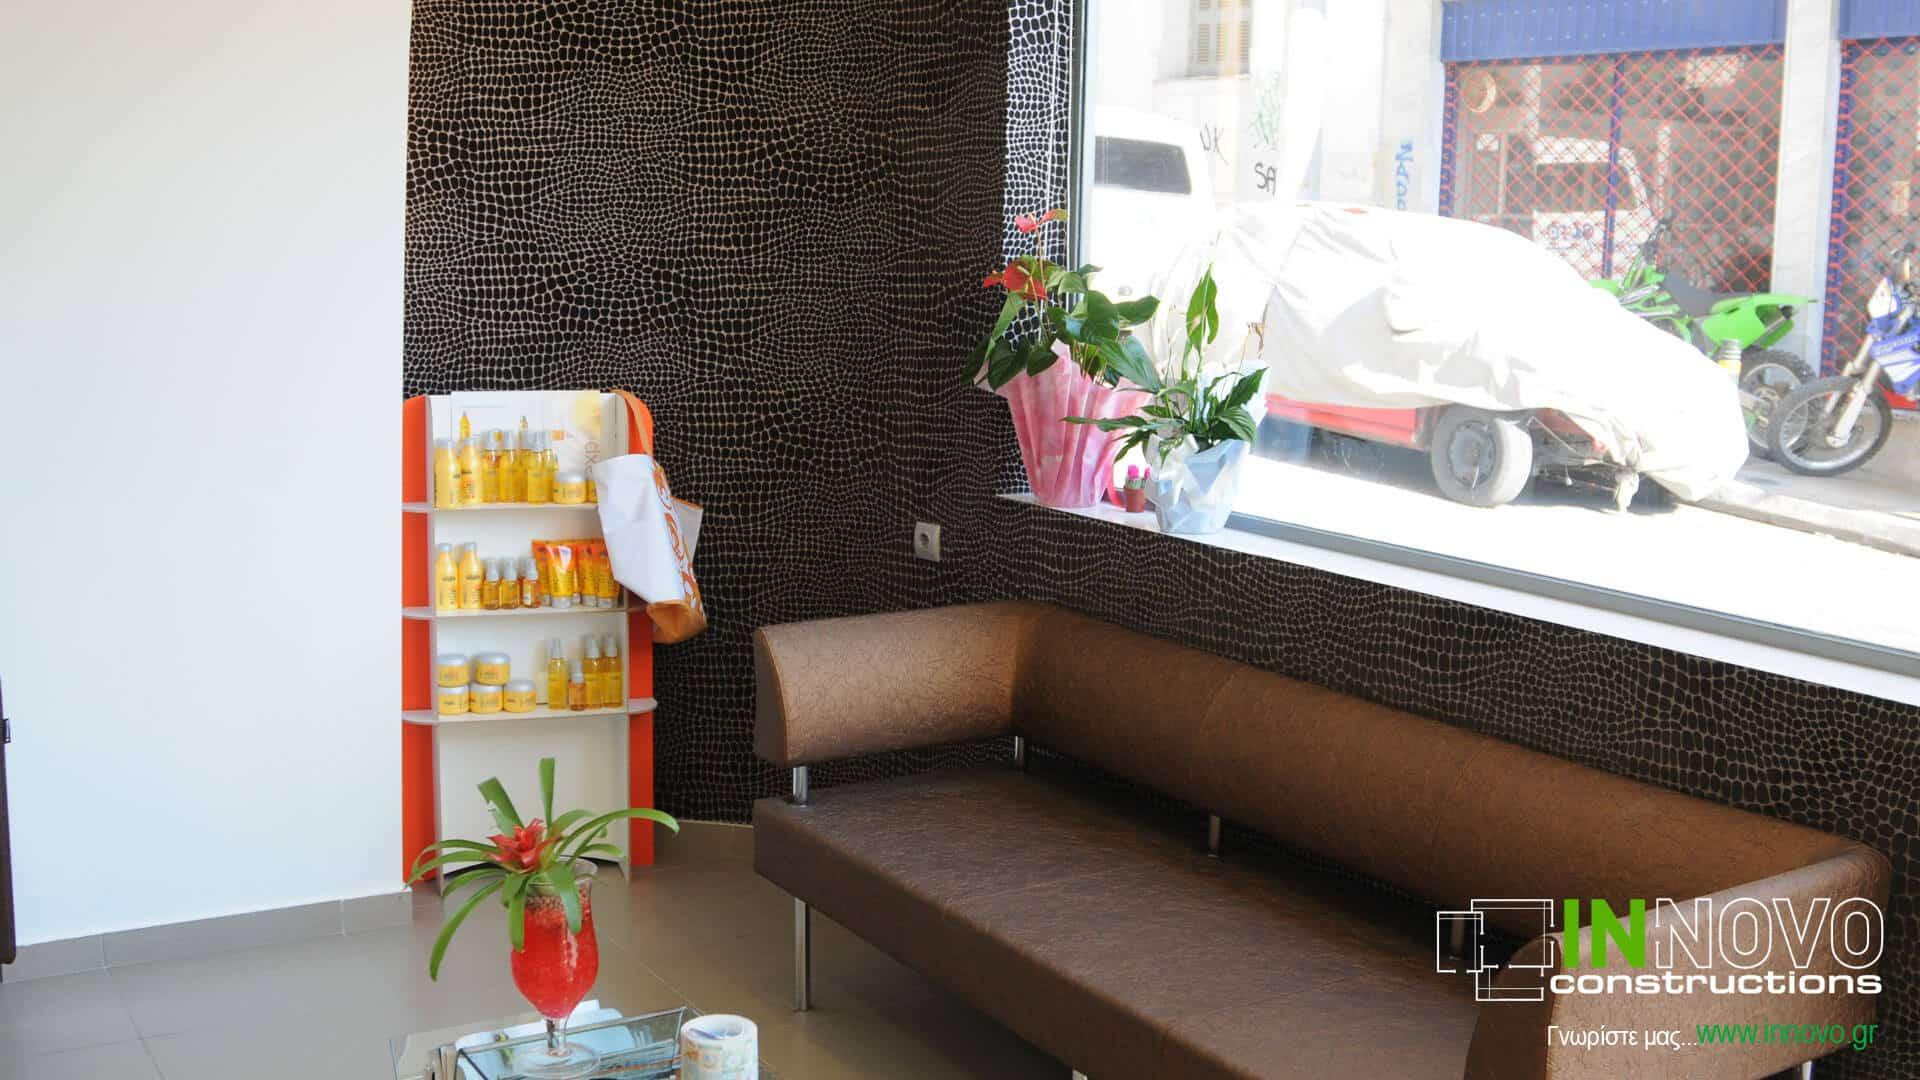 anakainisi-kommotiriou-hairdressers-renovation-kommotirio-politis-967-6